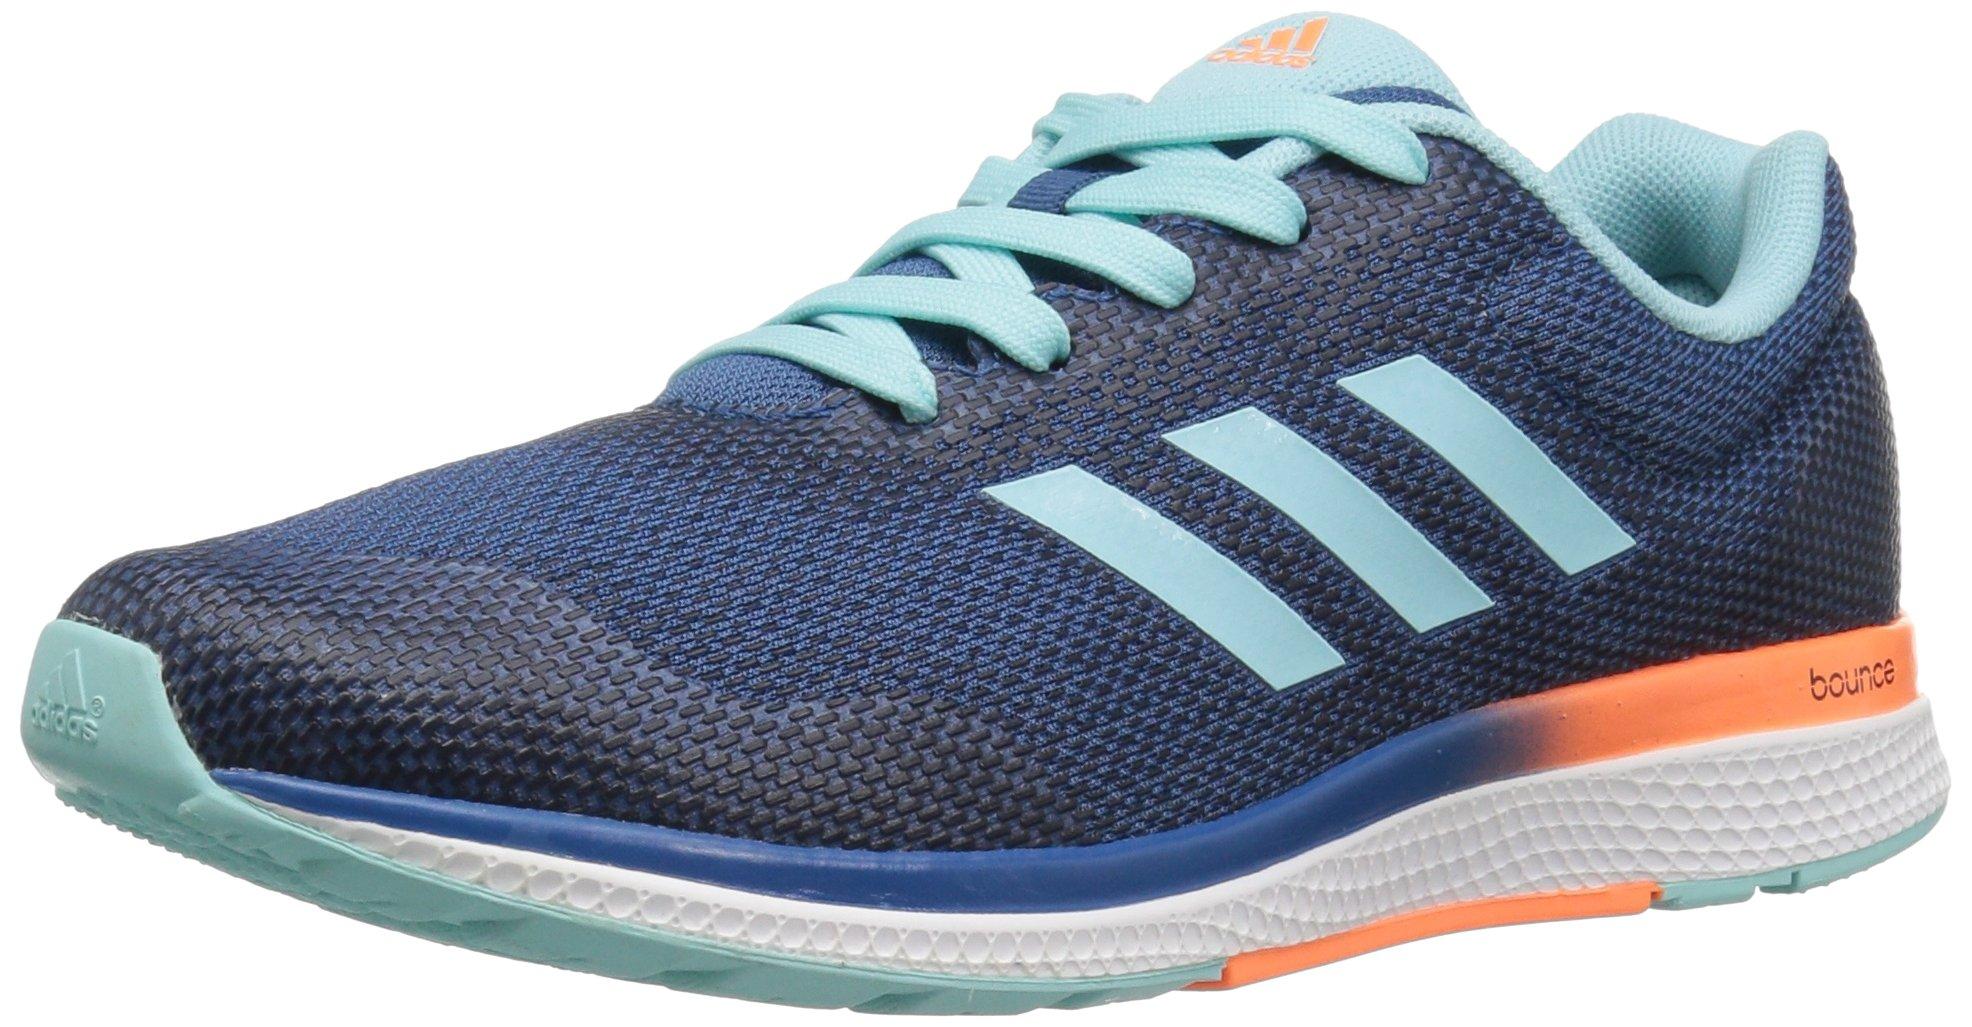 49512cb2fffaa Galleon - Adidas Performance Women s Mana Bounce 2 W Aramis Running Shoe